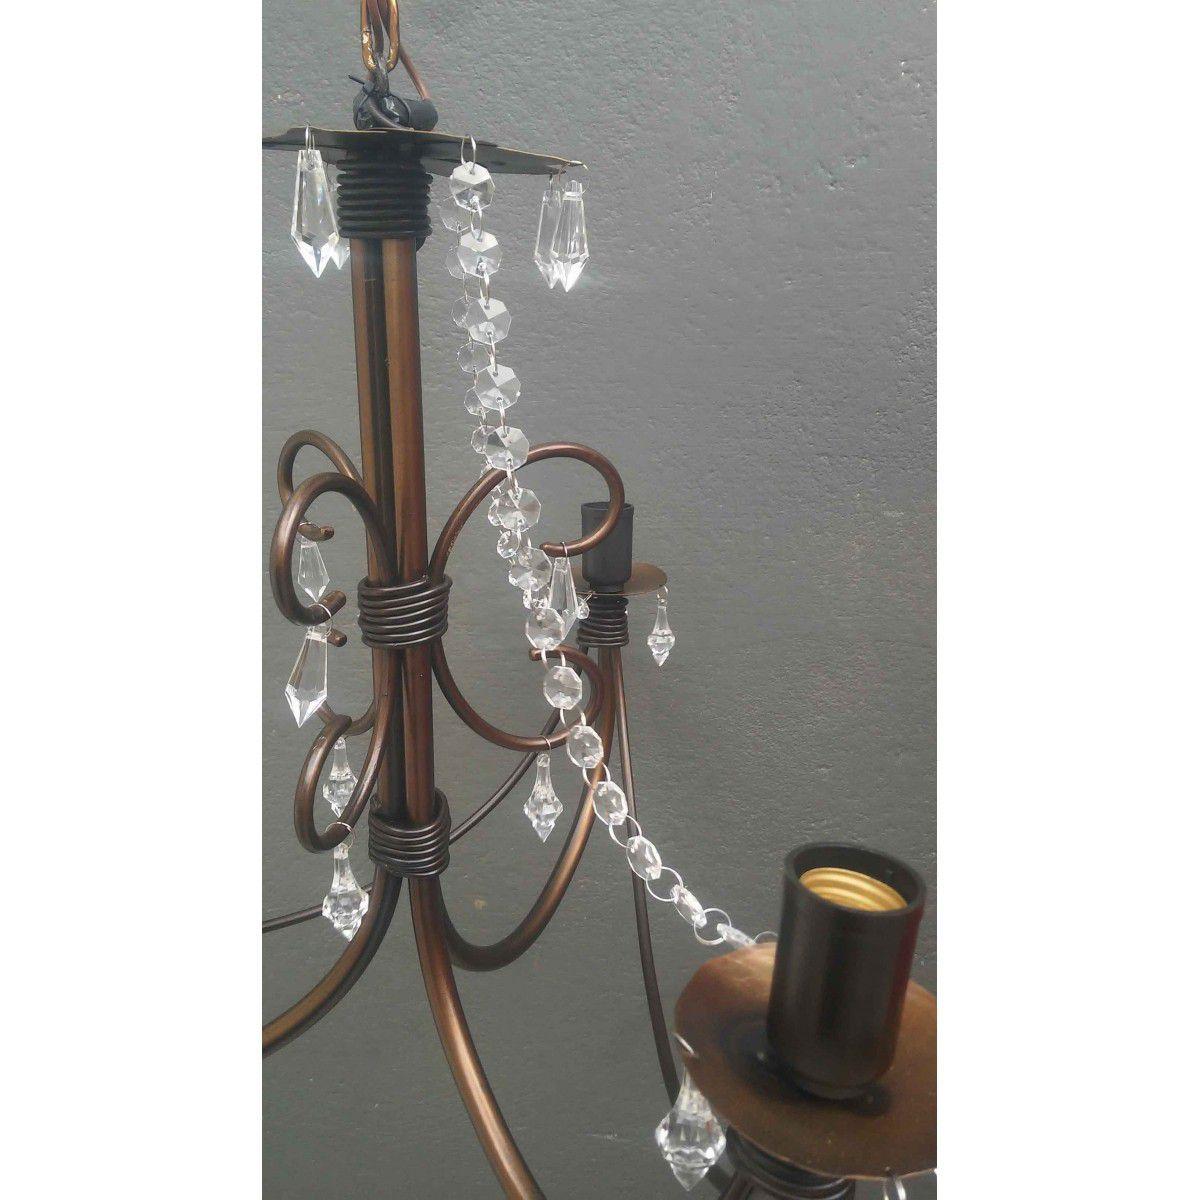 Luminaria De Ferro com Cristal Acrilico de Teto para Sala de Jantar